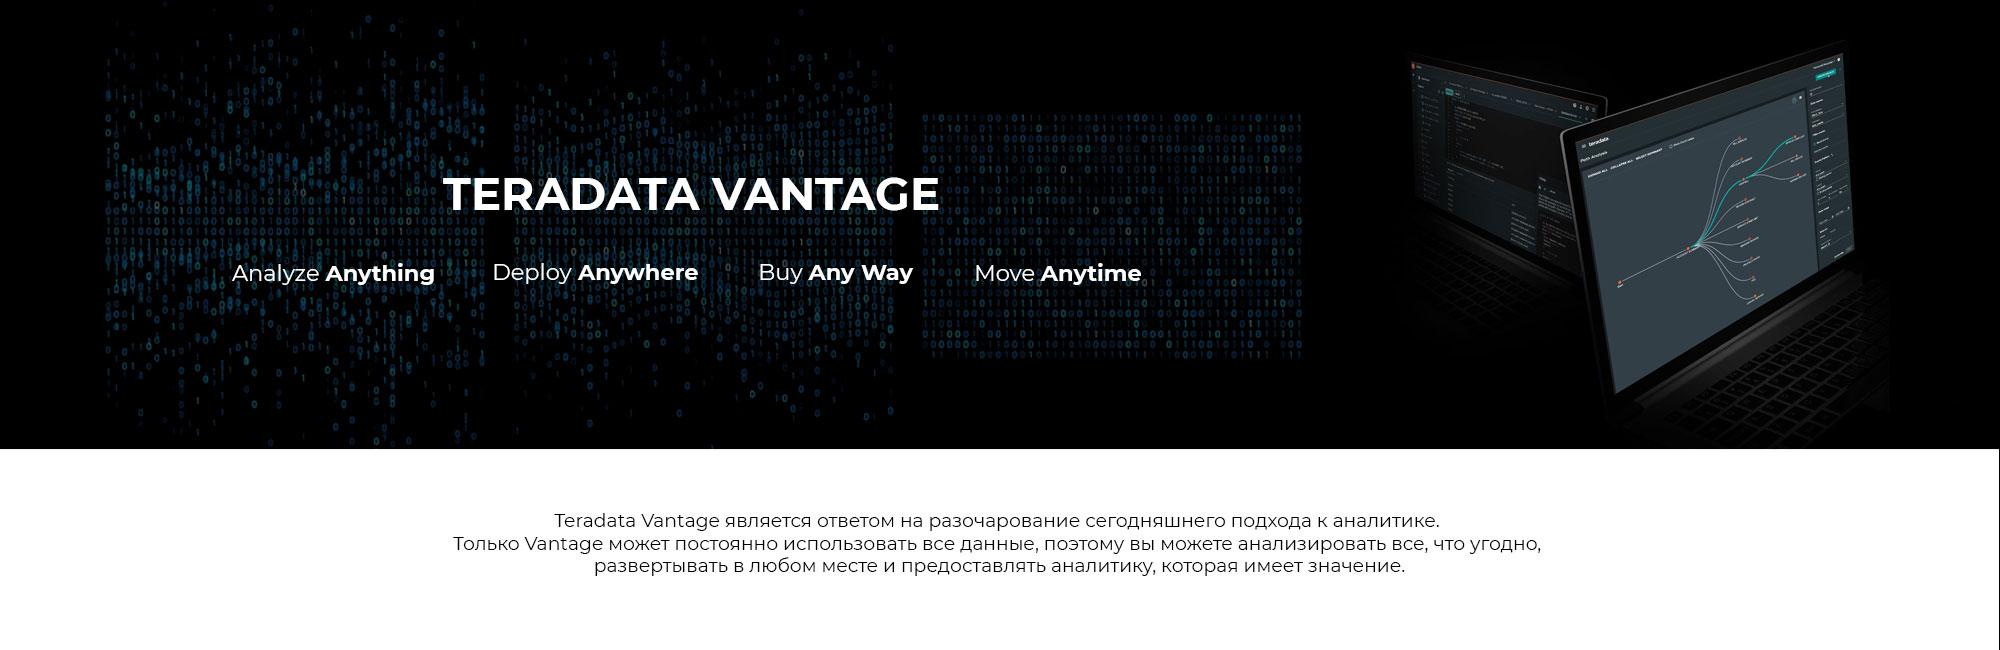 Teradata-Vantage-всесторонний-анализ-данных